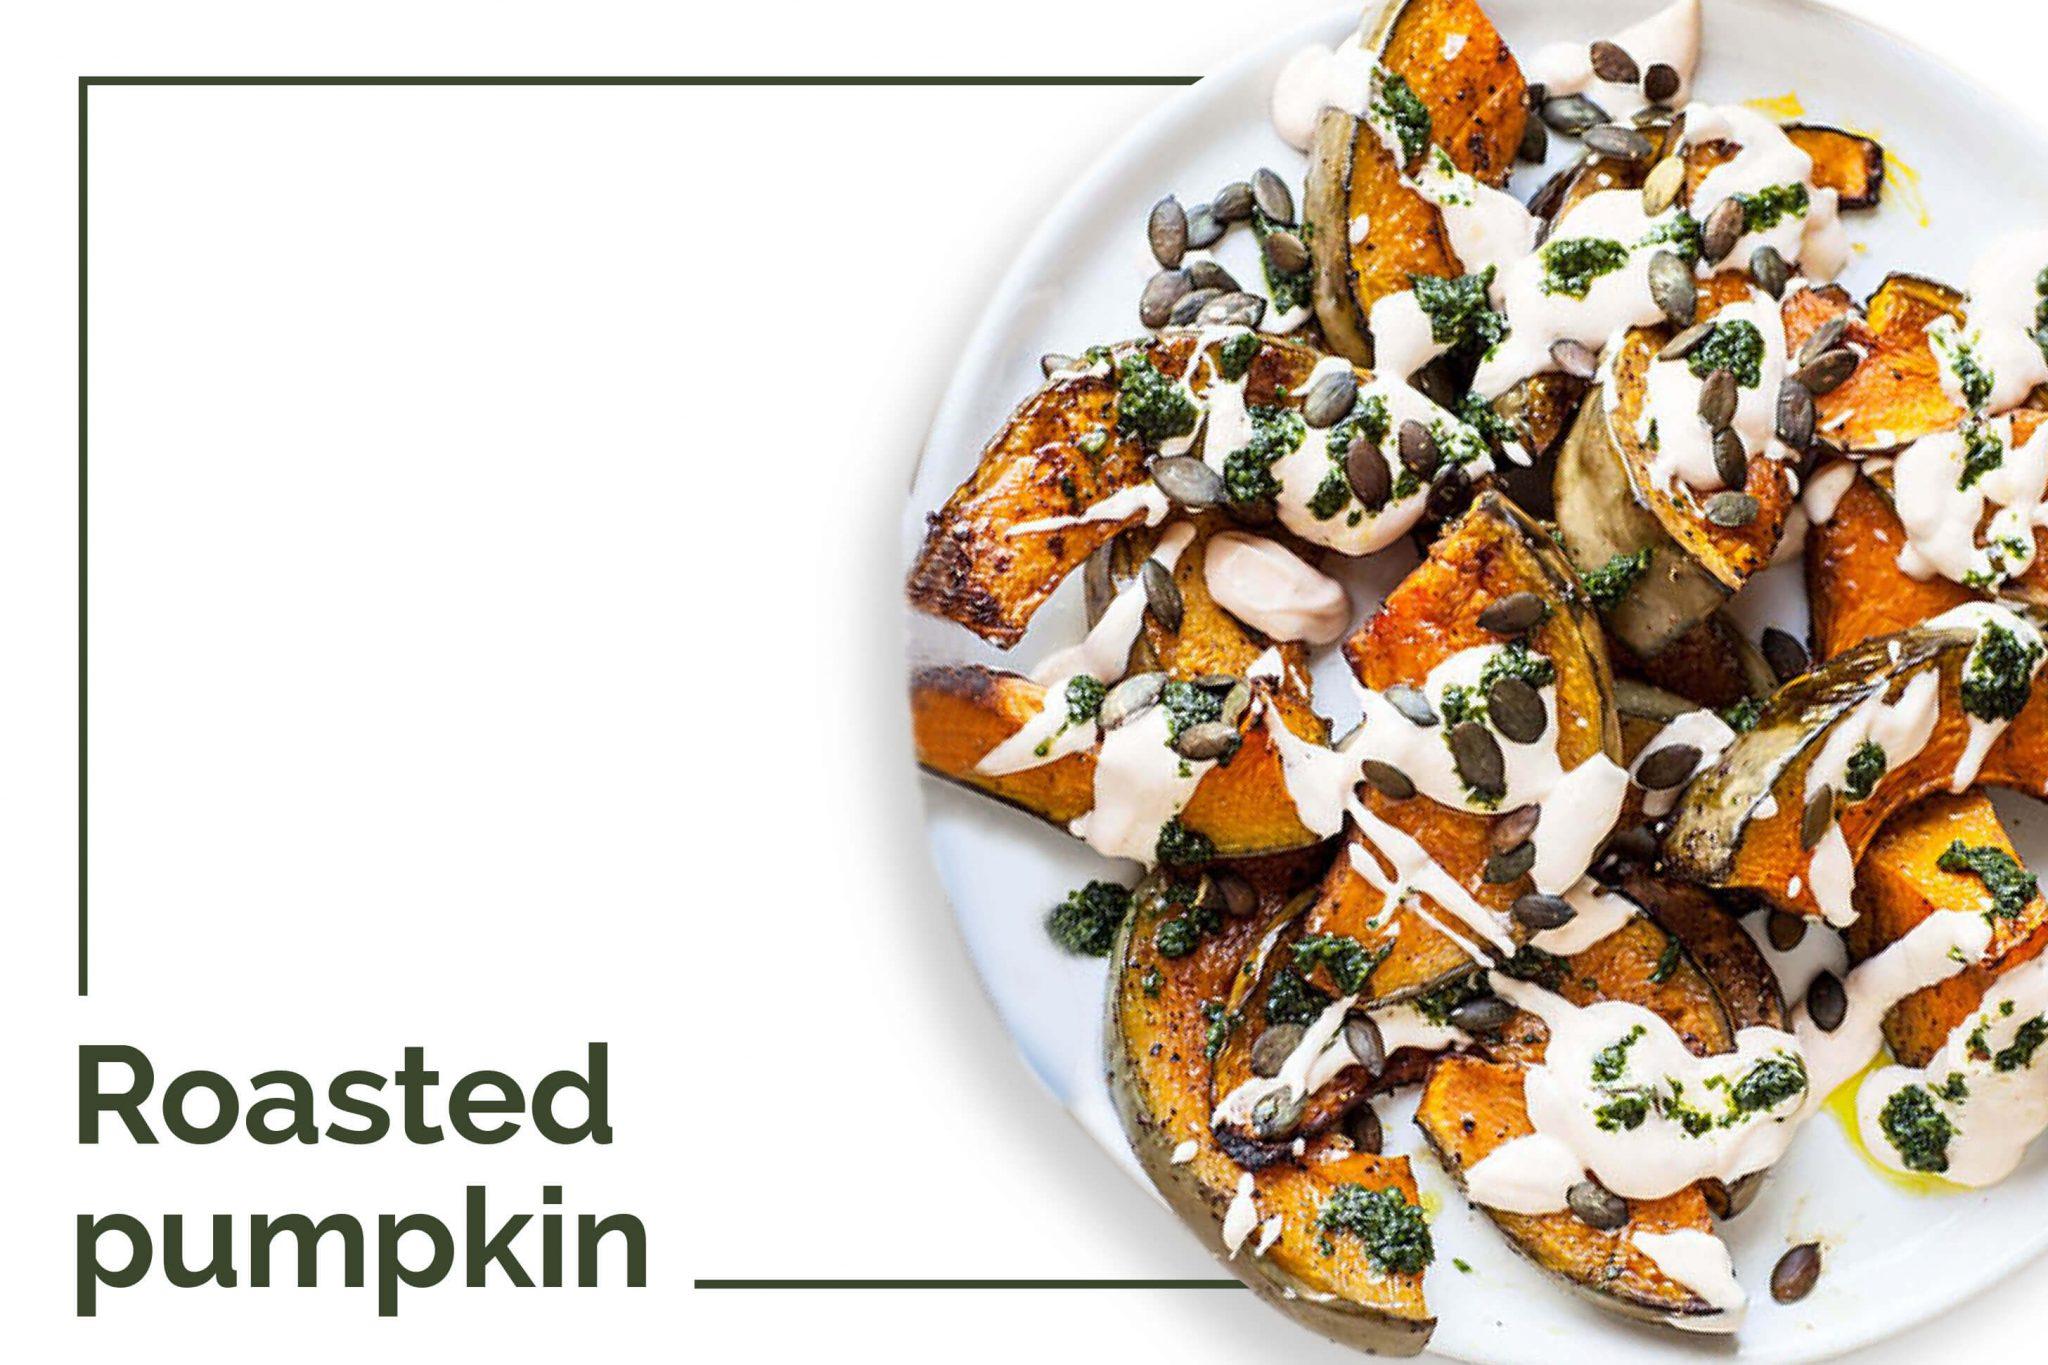 Tasty roasted pumpkin in white plate